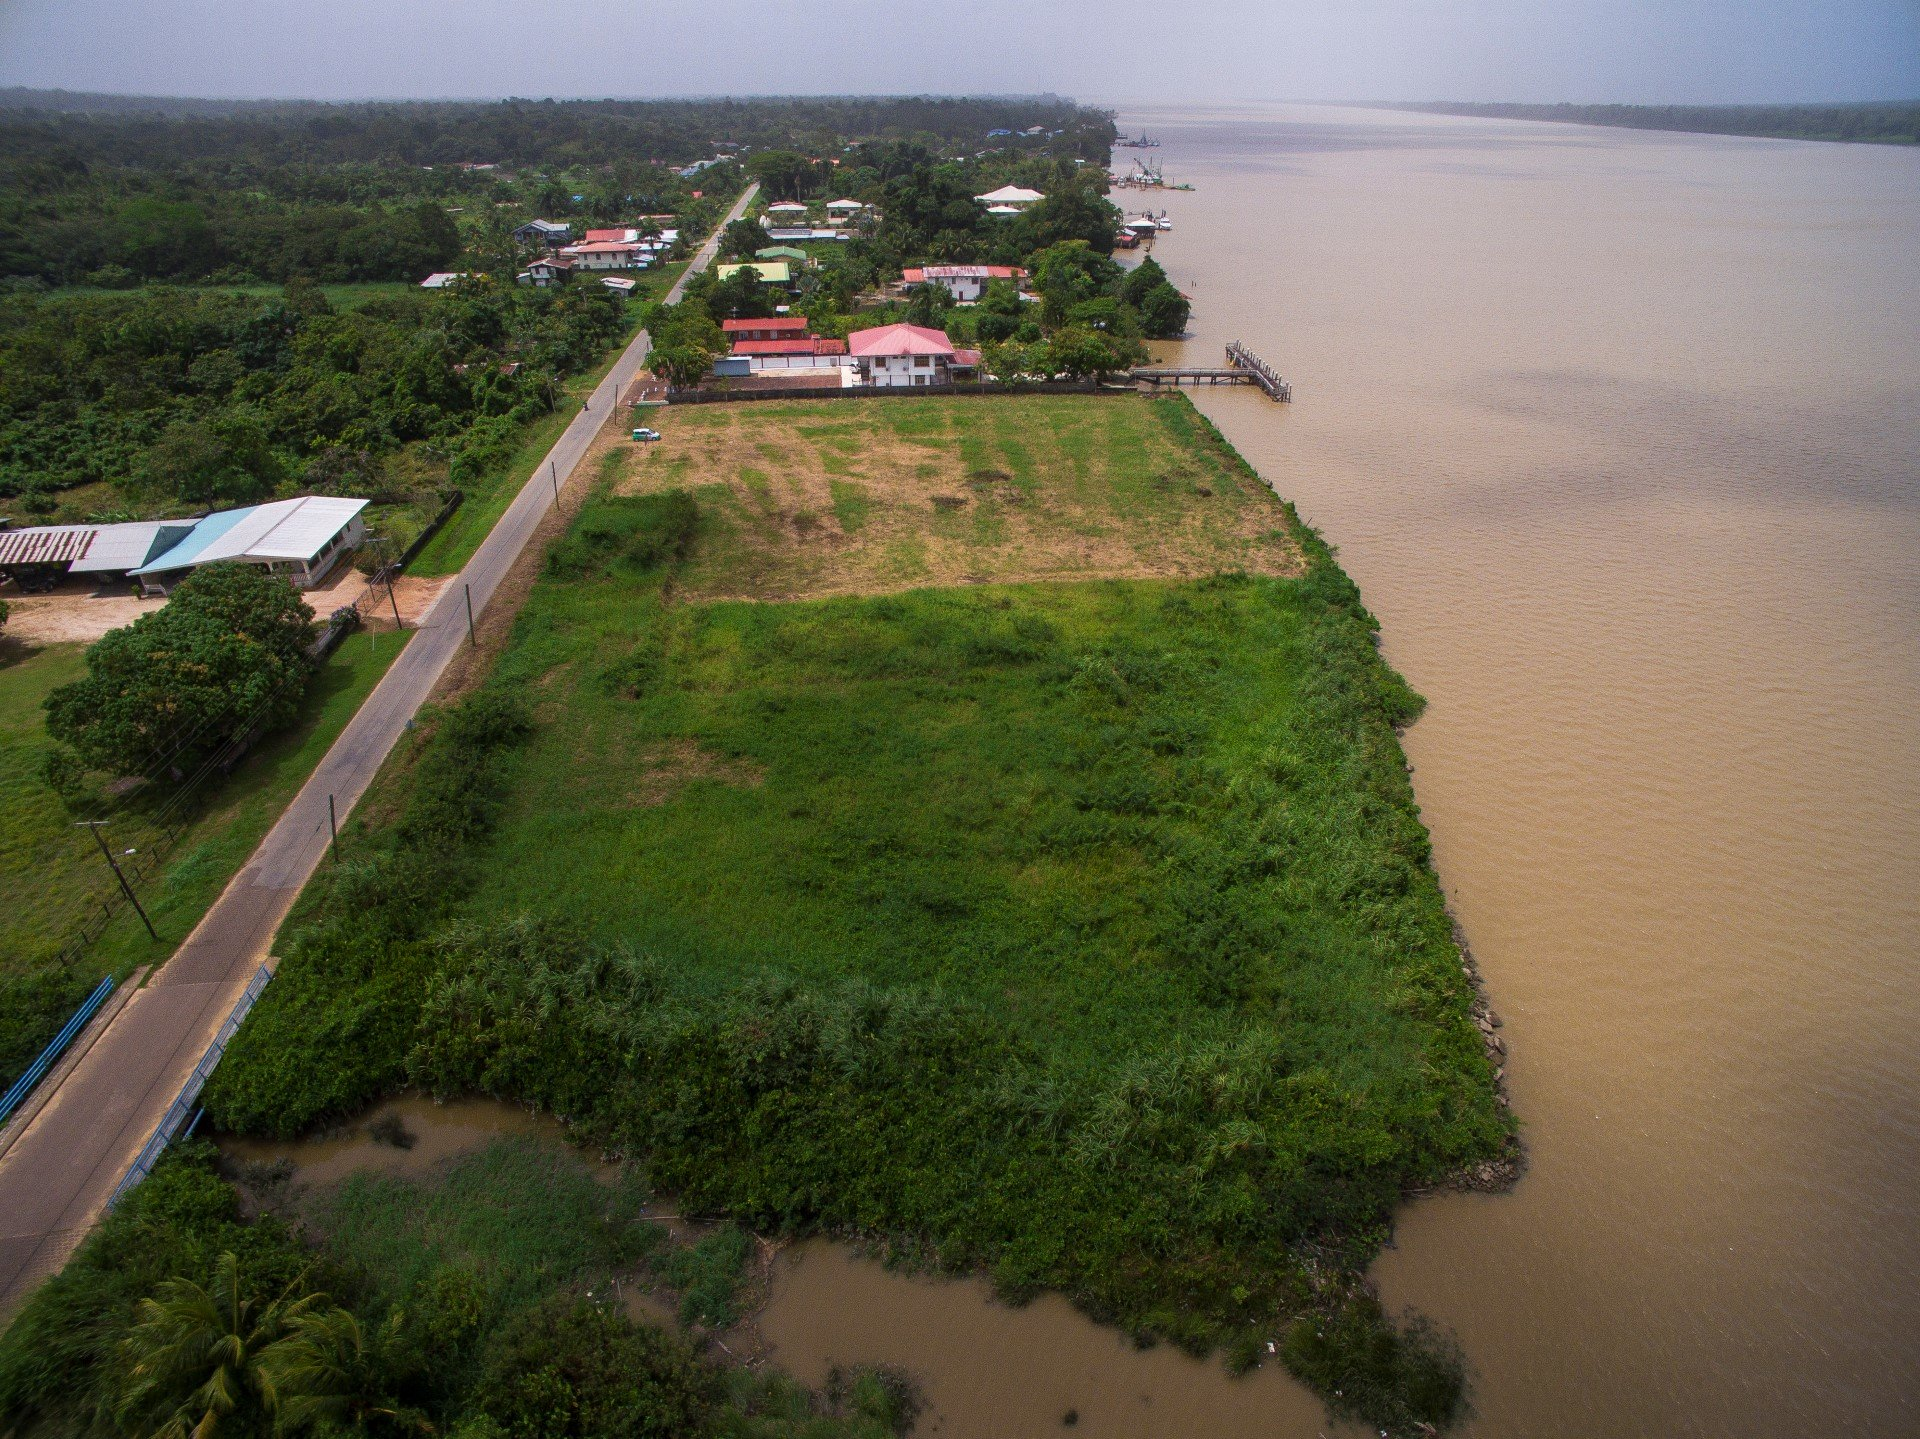 Sir Winston Churchillweg P0301B6 - Boxel, Domburg - Suriname - Surgoed Makelaardij NV